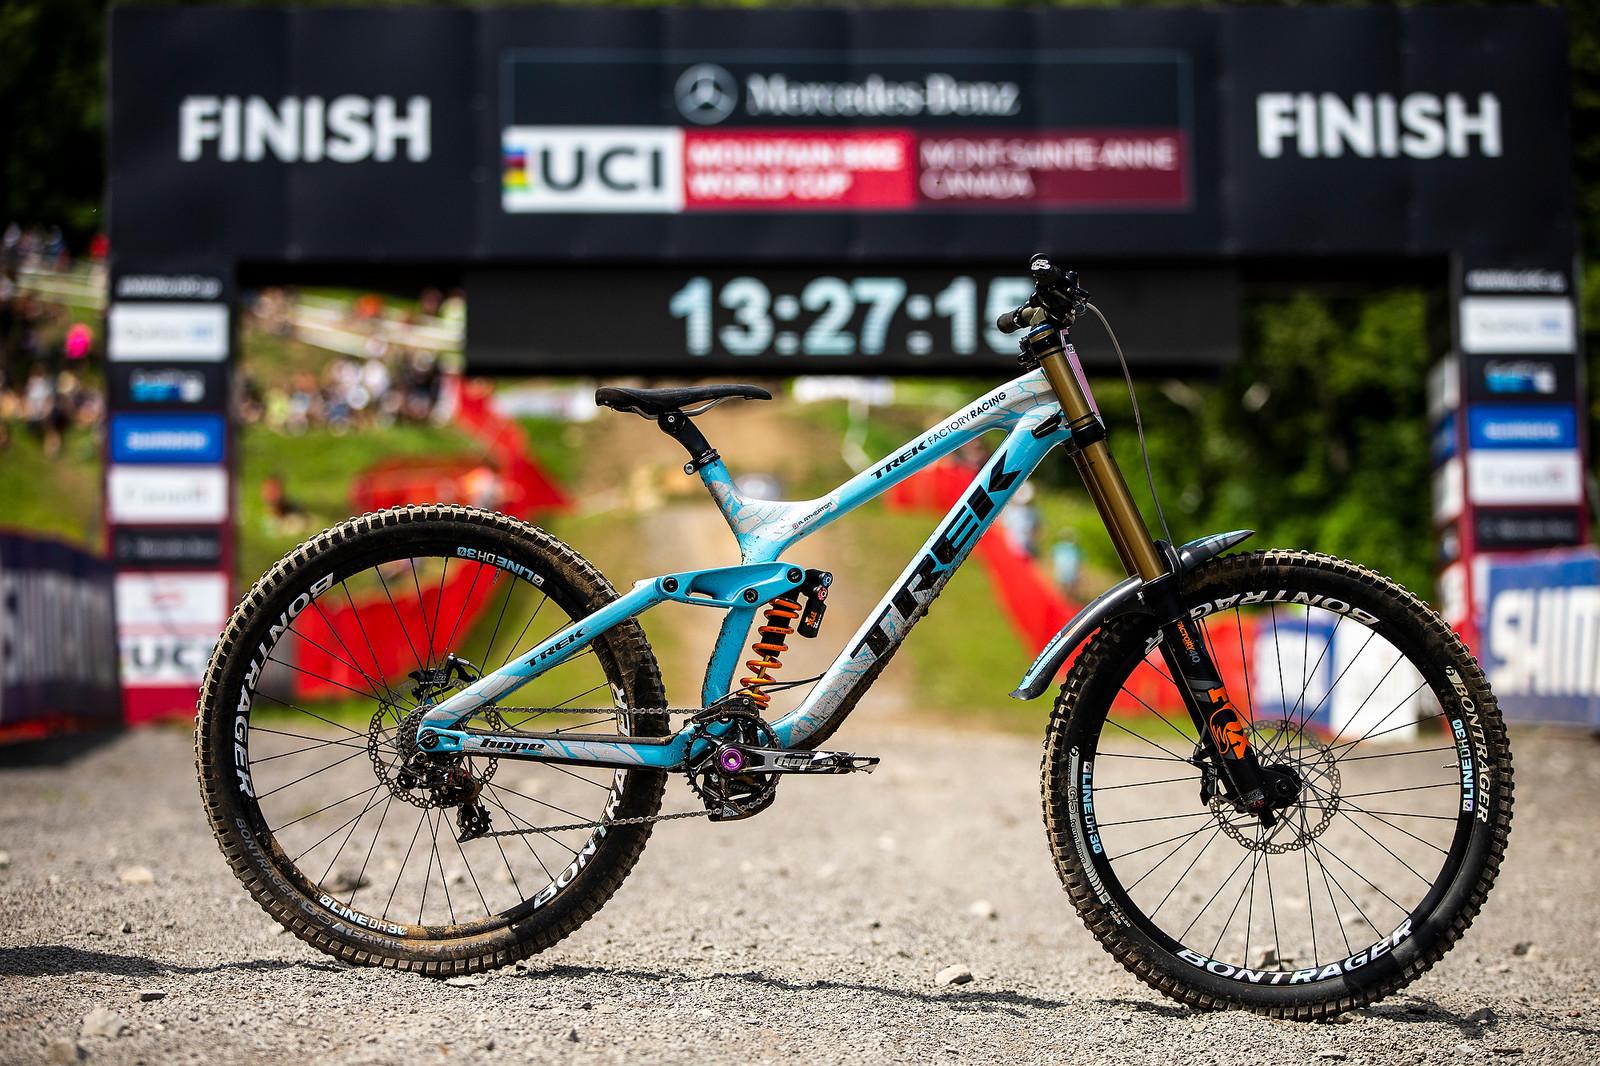 MSA 2018 WINNING BIKE: Rachel Atherton's Trek Session - MSA 2018 Winning Bike: Rachel Atherton's Trek Session - Mountain Biking Pictures - Vital MTB